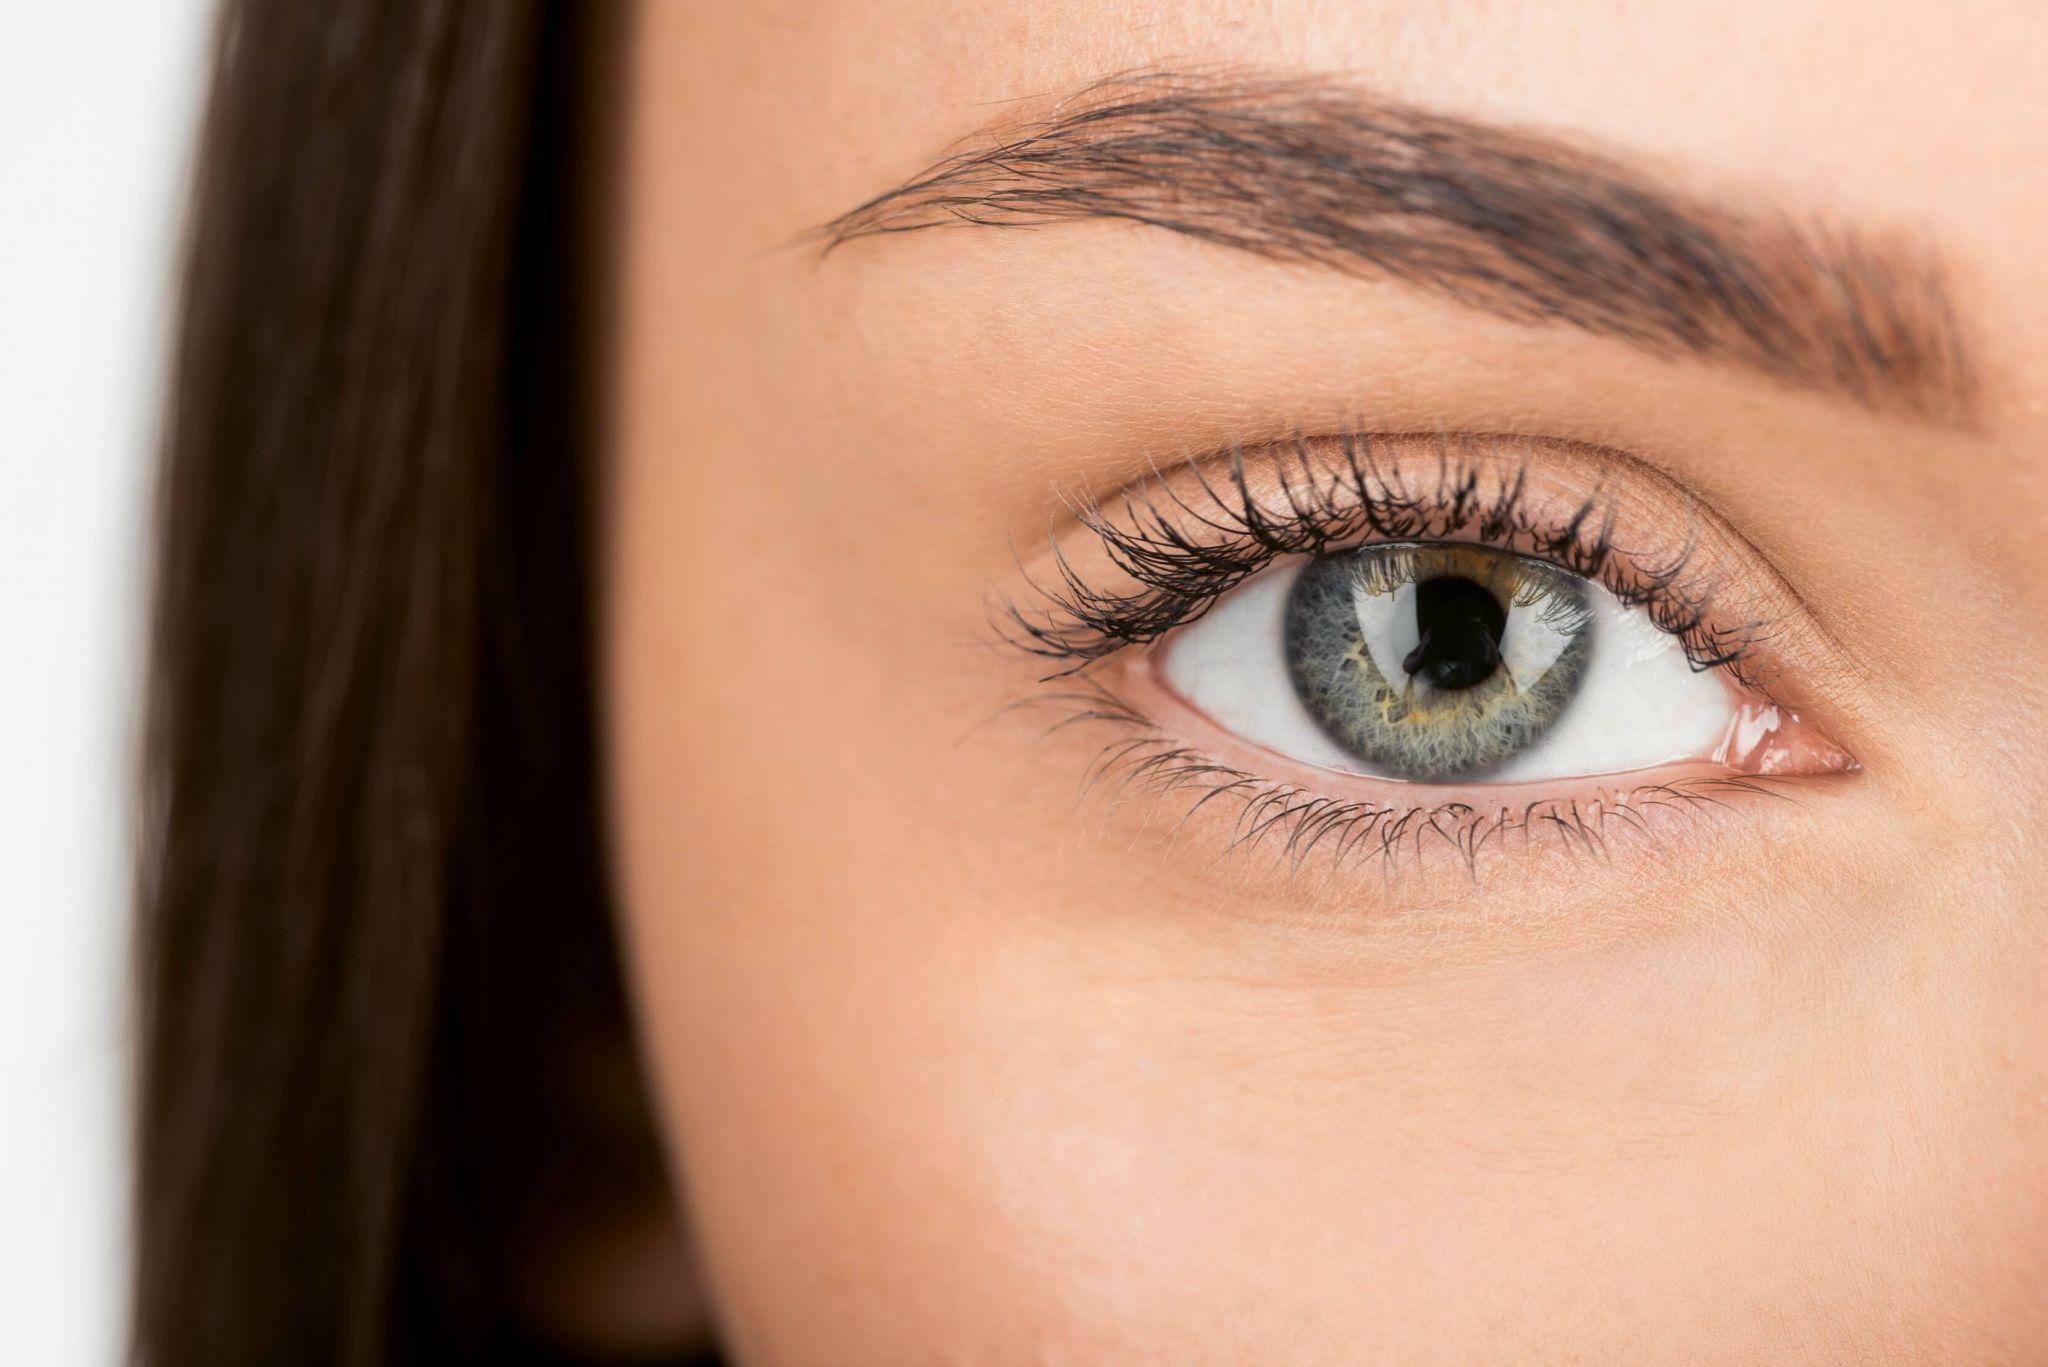 Collyre Bleu eyedrops - close up of woman's eyes